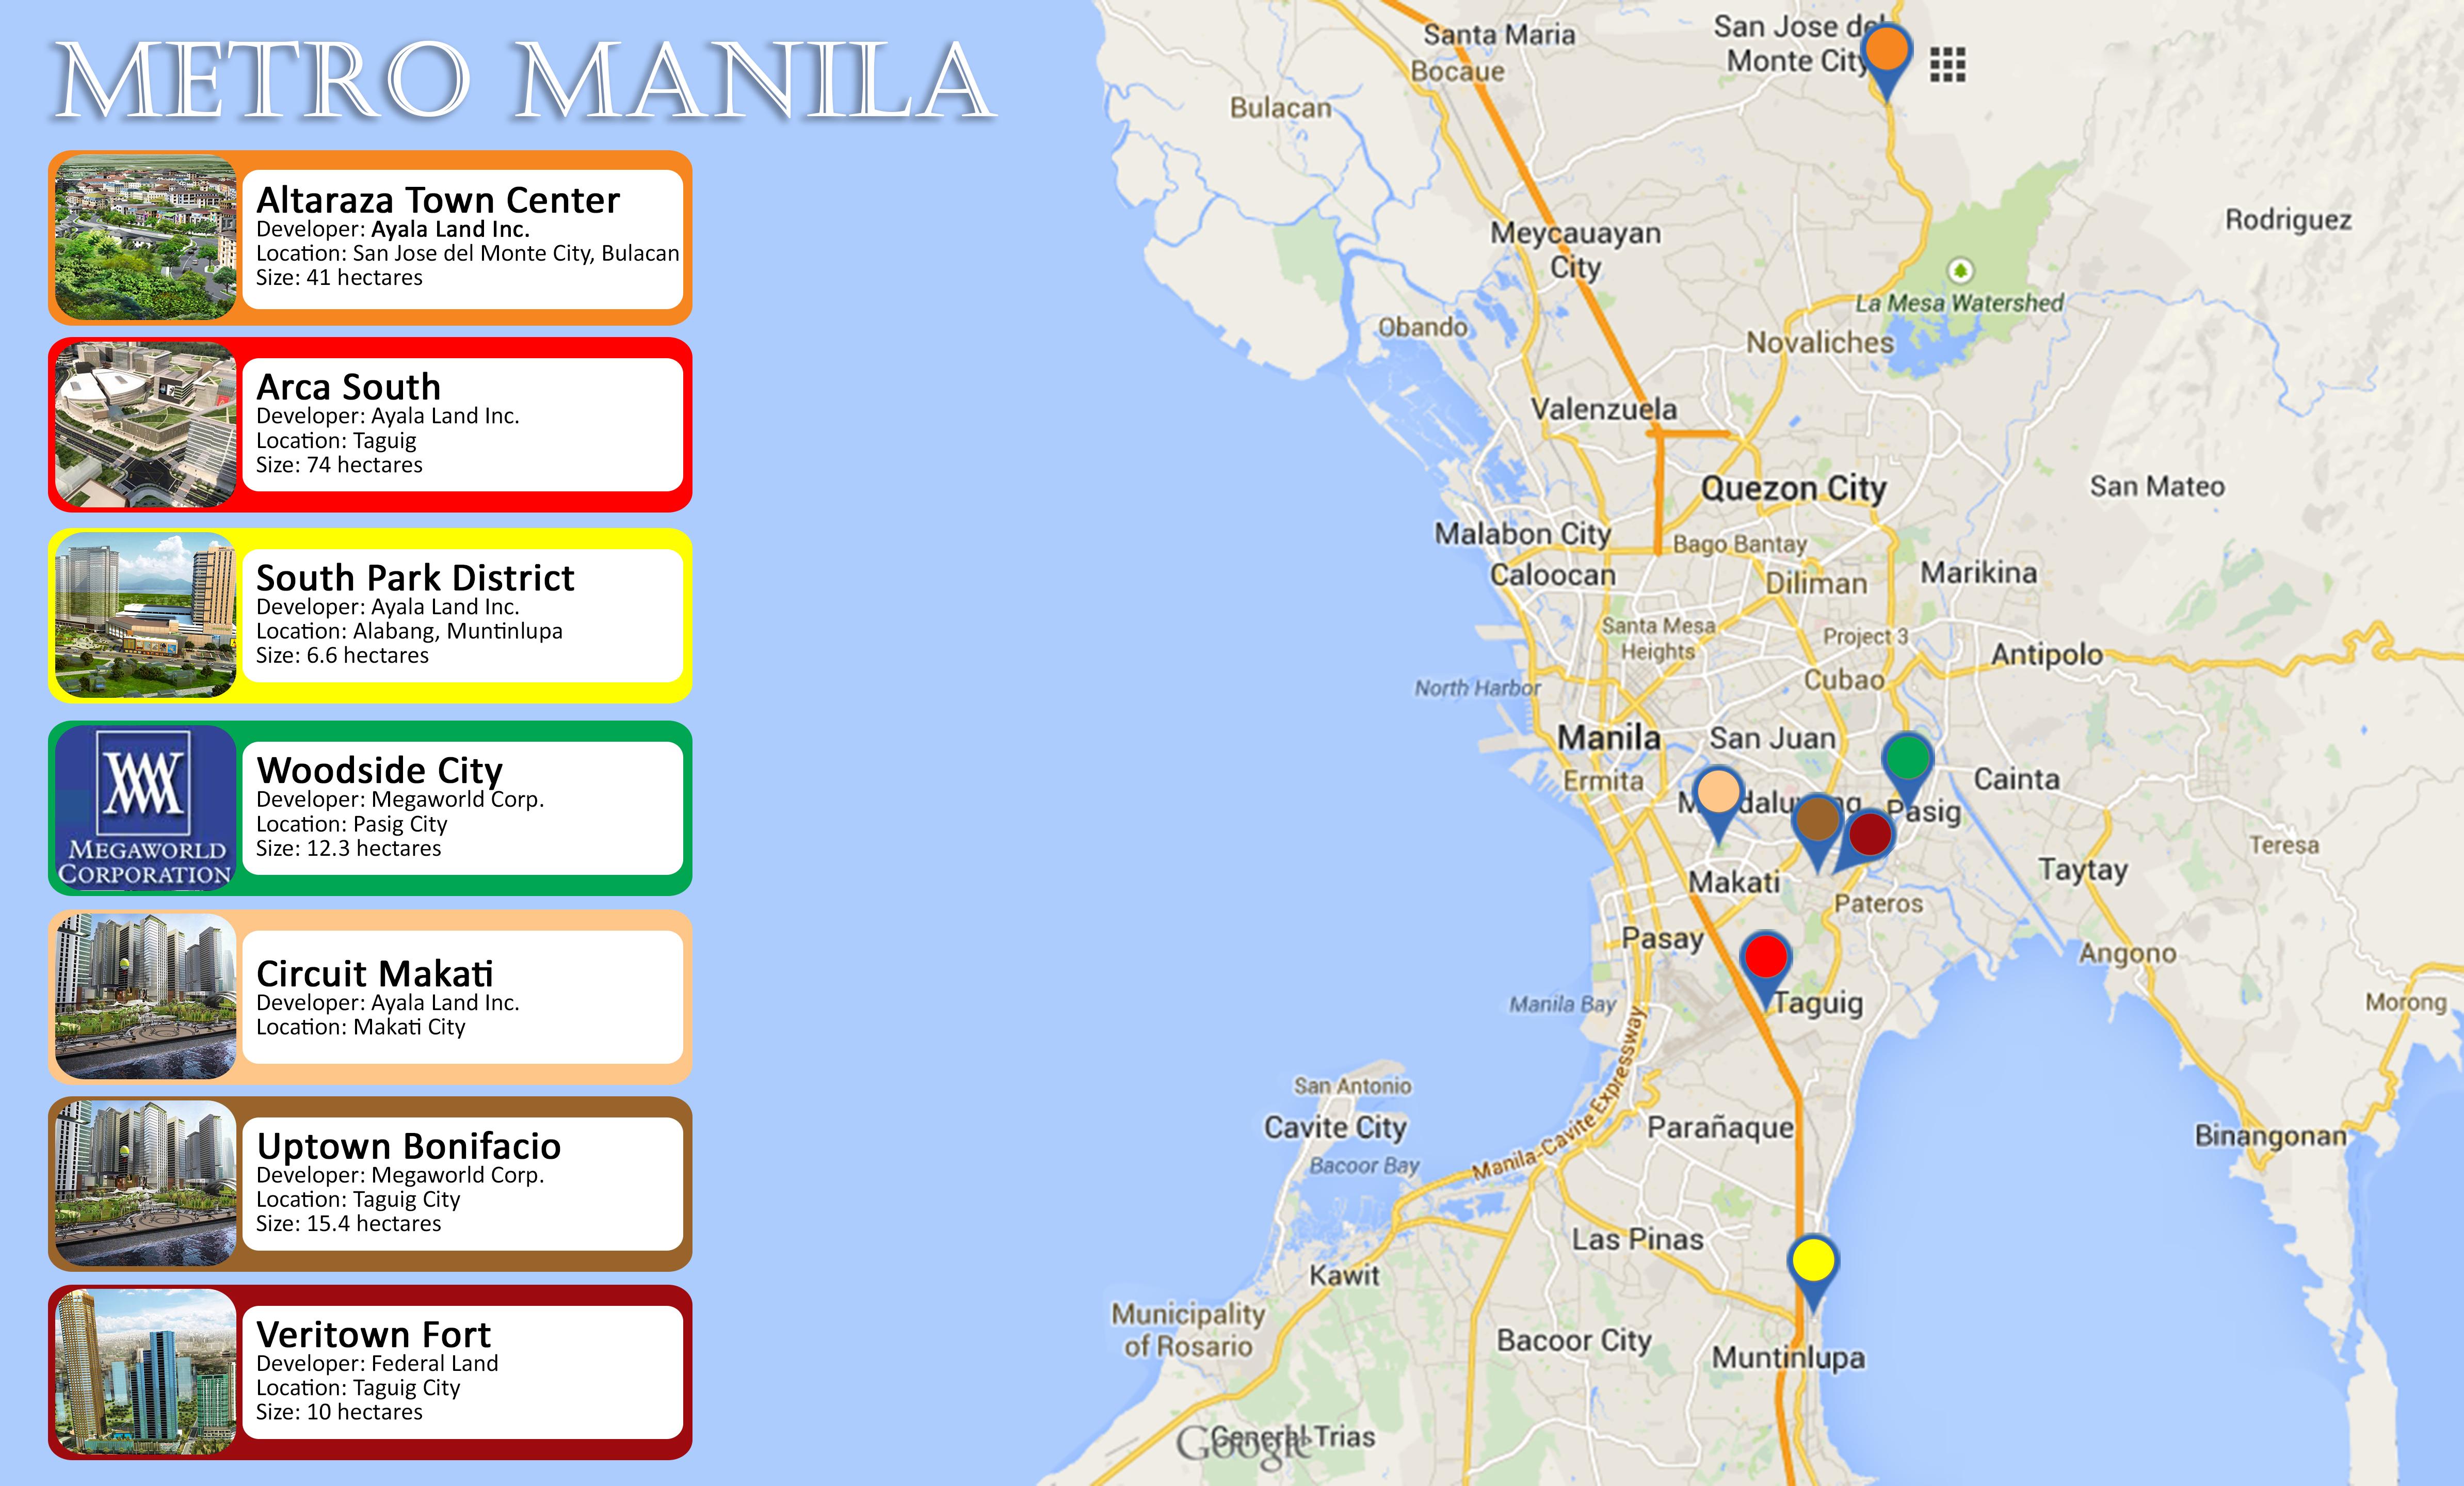 methodology metro manila and caloocan city